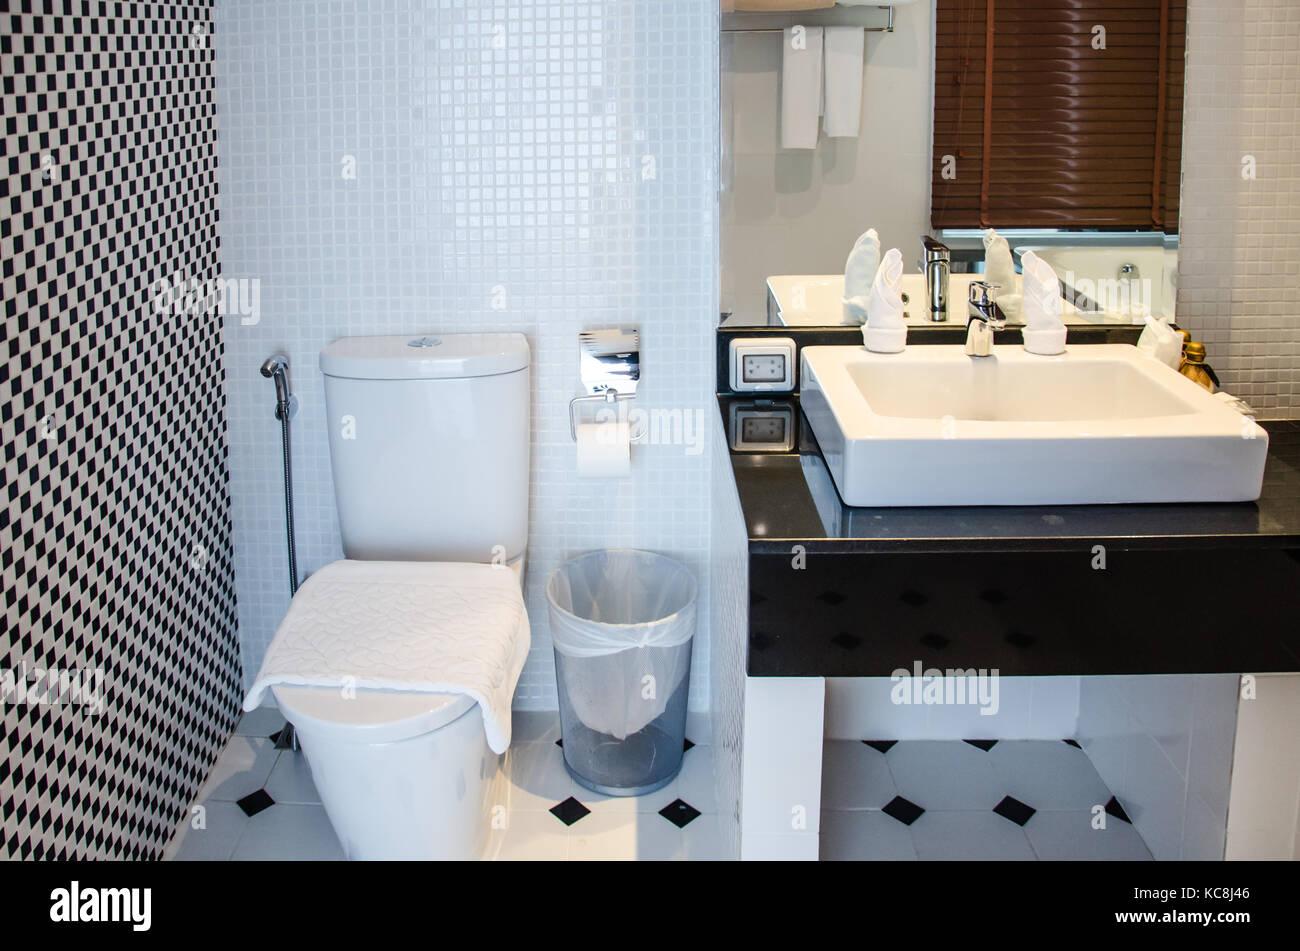 Luxury Toilet Stock Photos & Luxury Toilet Stock Images - Alamy